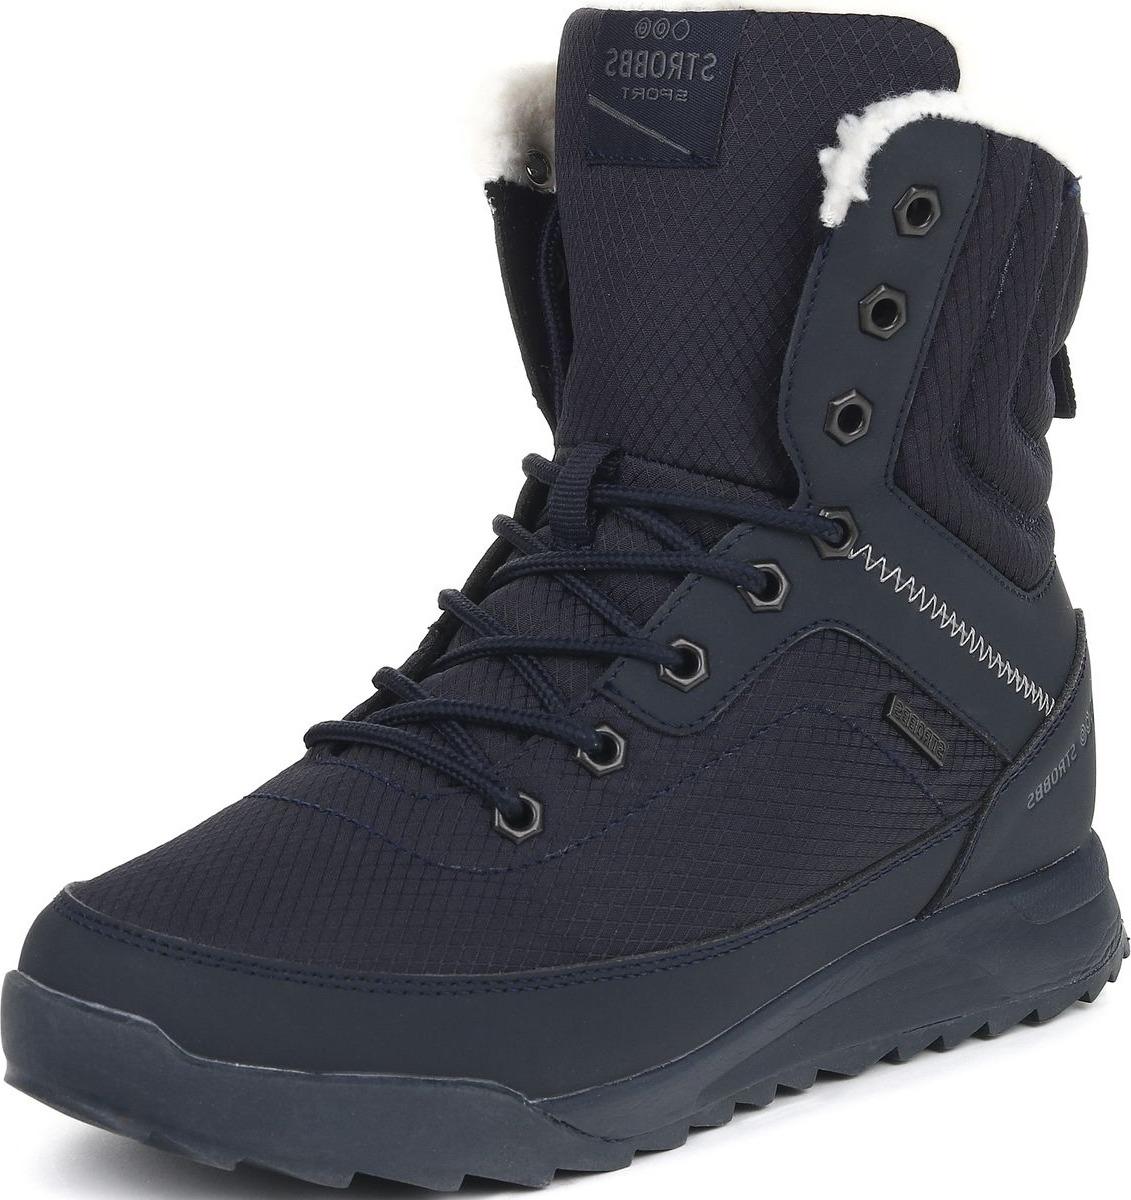 Ботинки Strobbs strobbs c9064 2